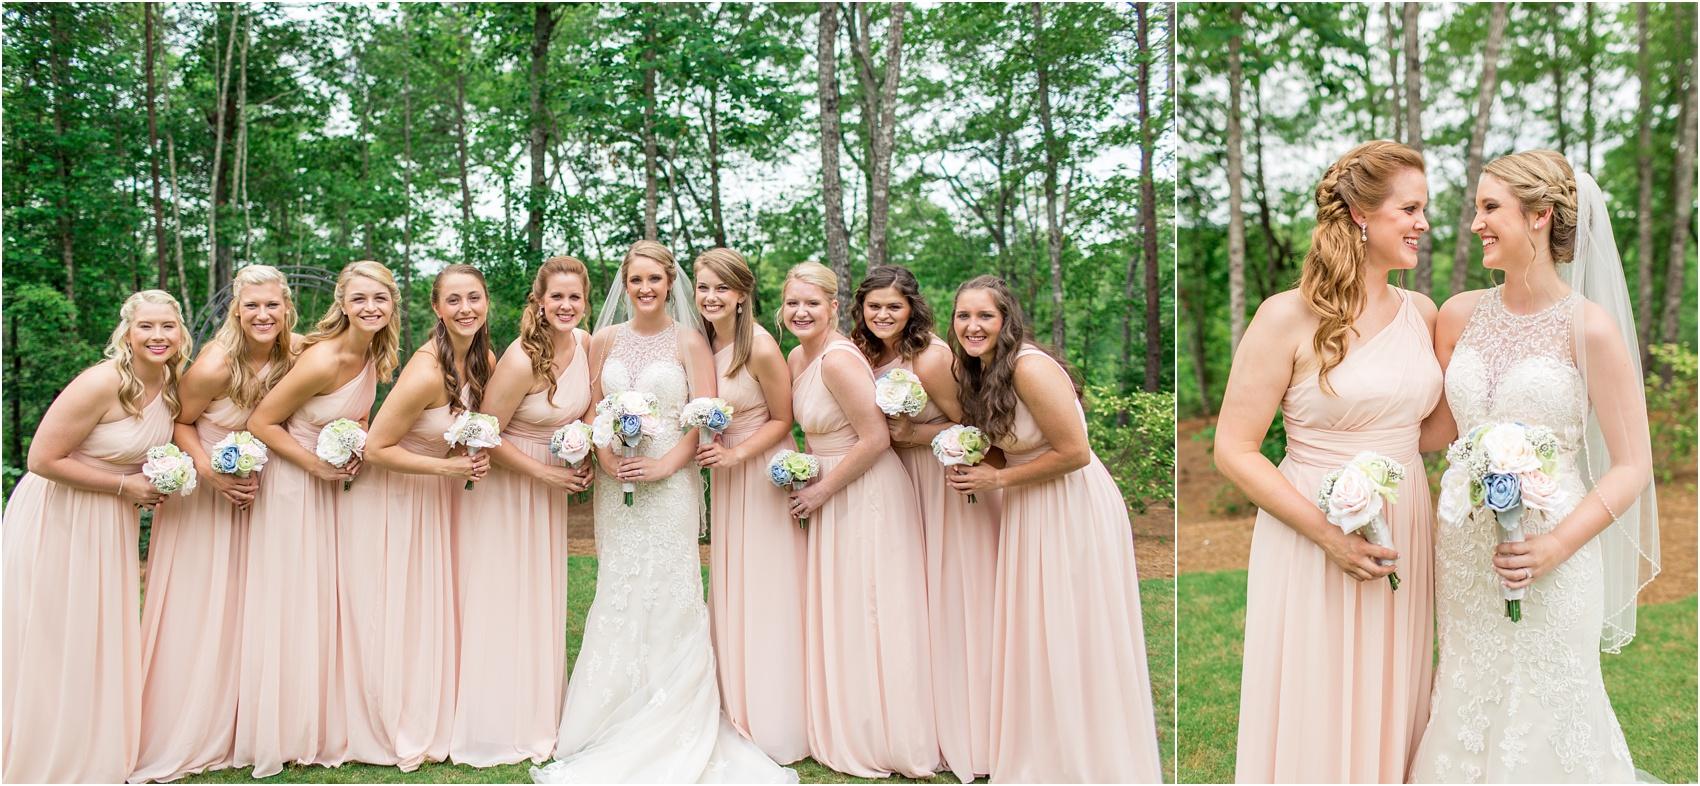 Savannah Eve Photography- Roper-Powell Wedding- Blog-15.jpg